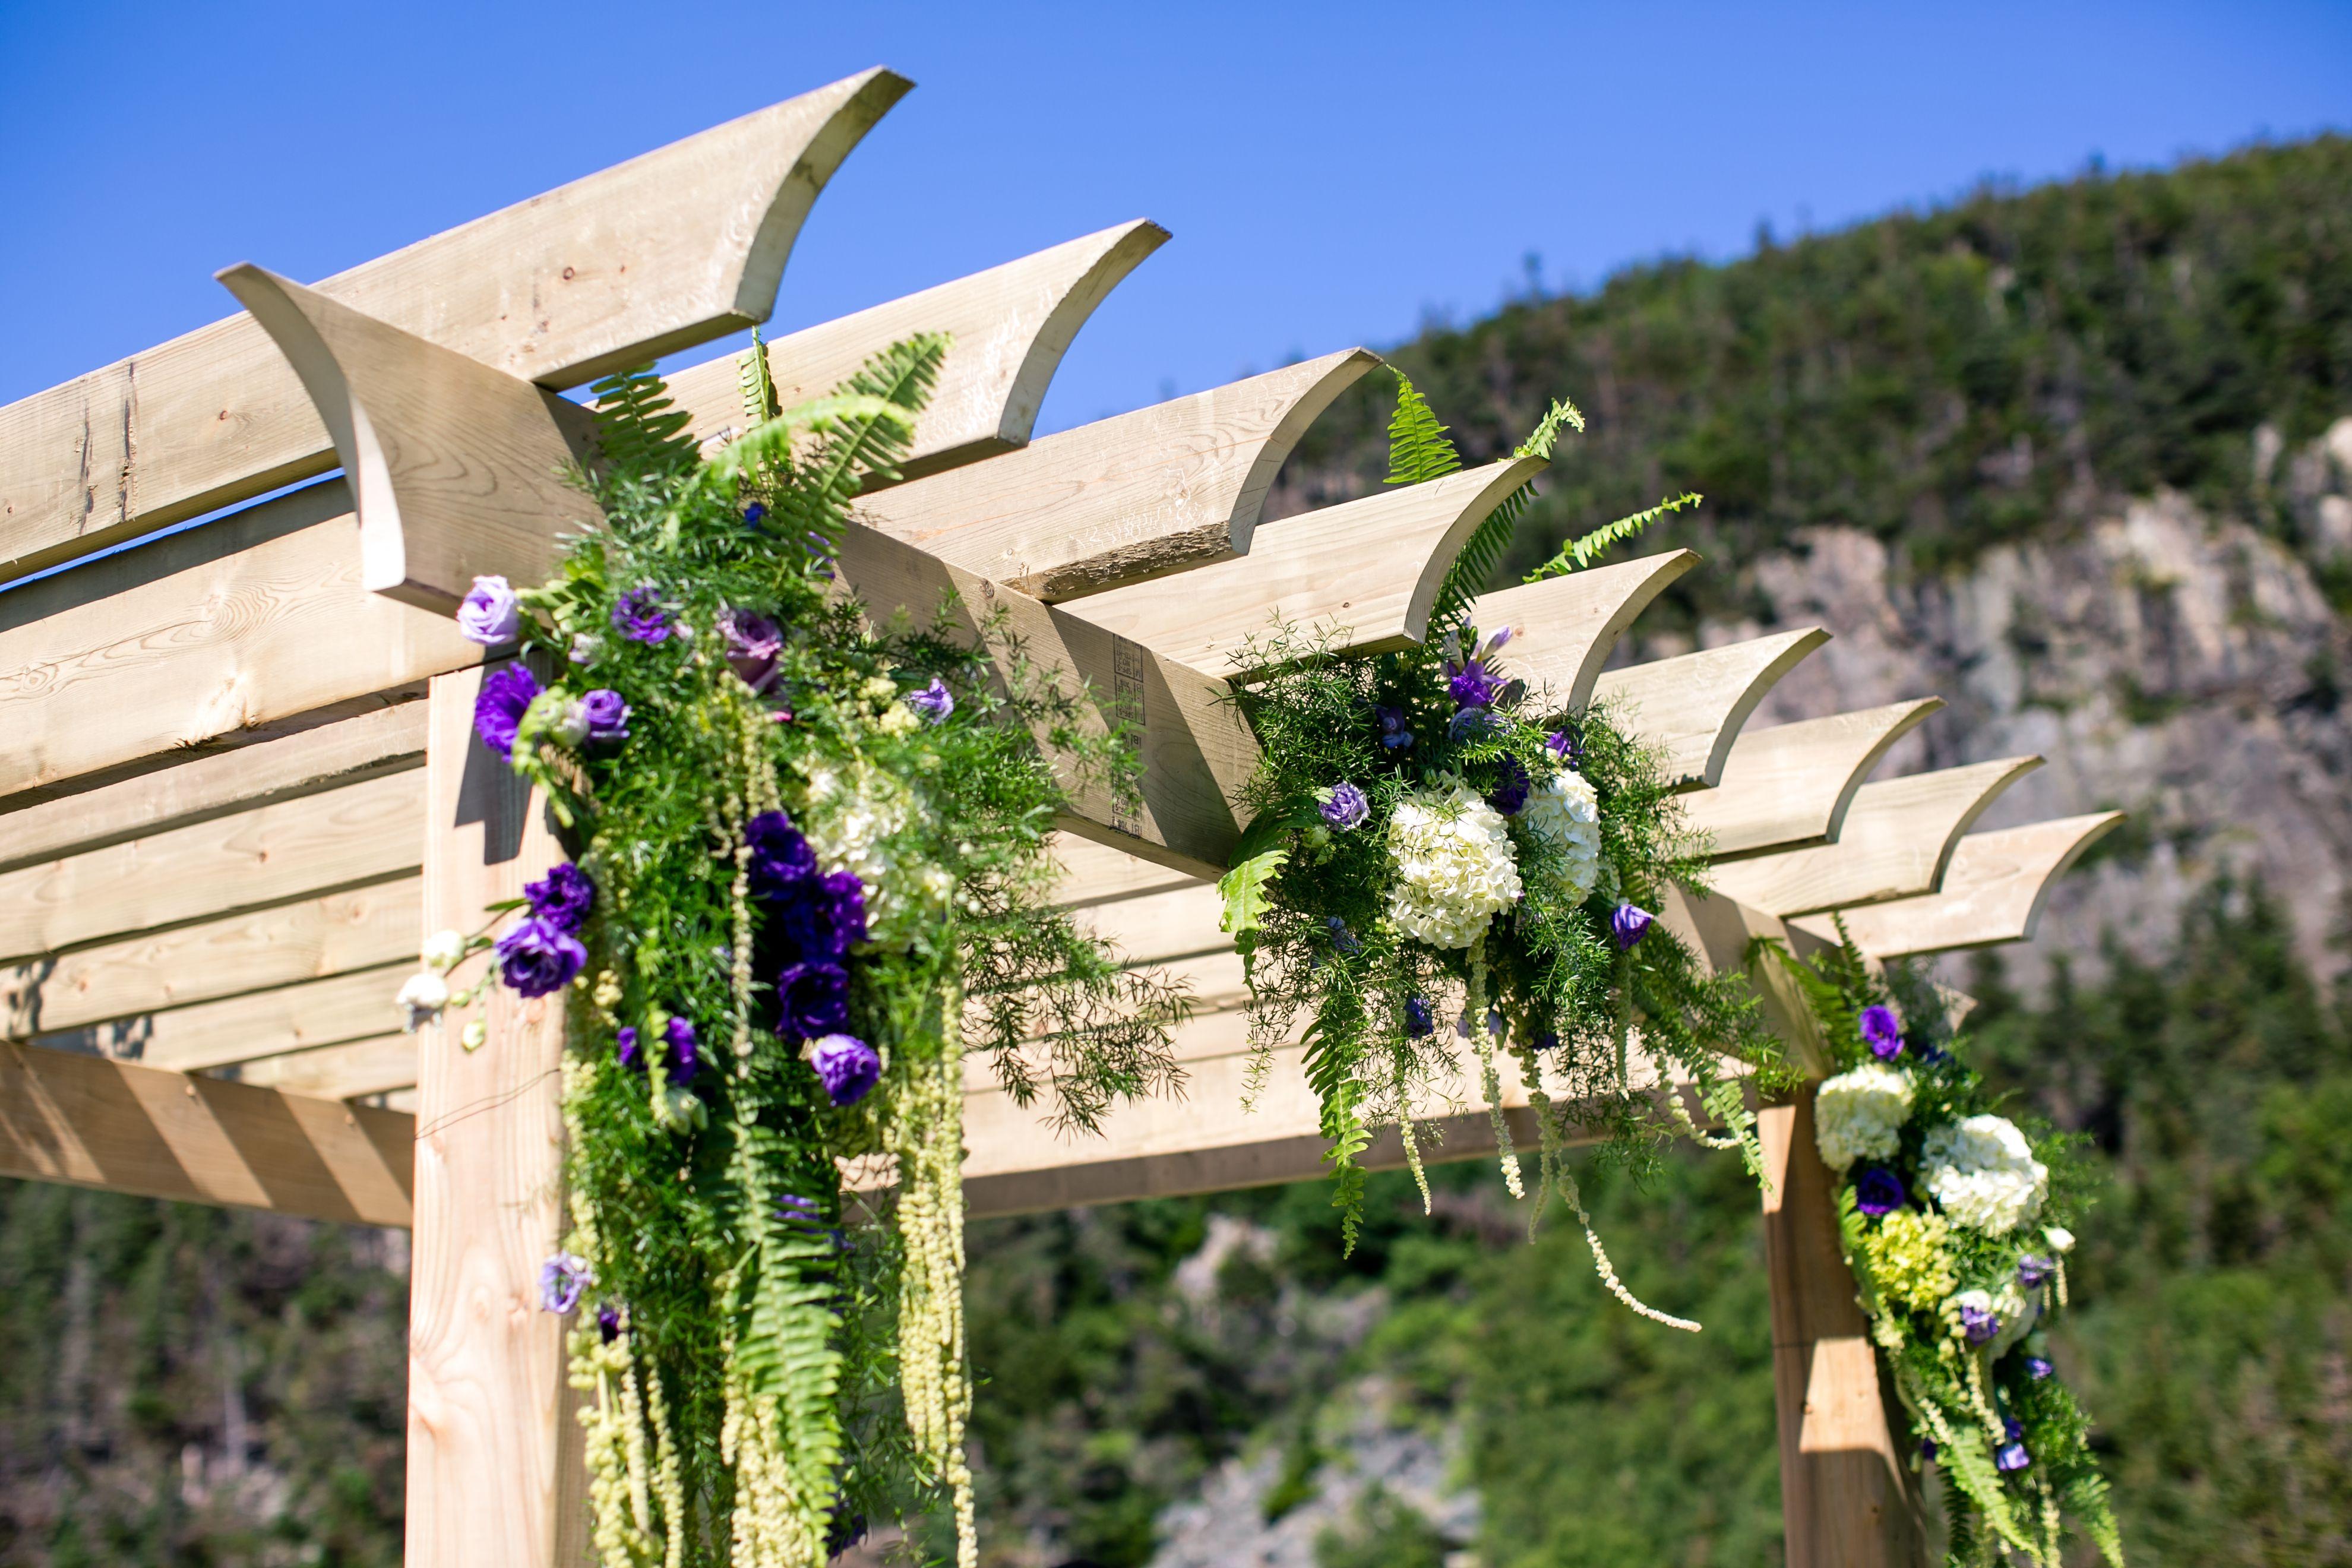 Wedding Arbor# rustic# purple# green# draping flowers# outdoor wedding# Conception Bay Newfoundland#